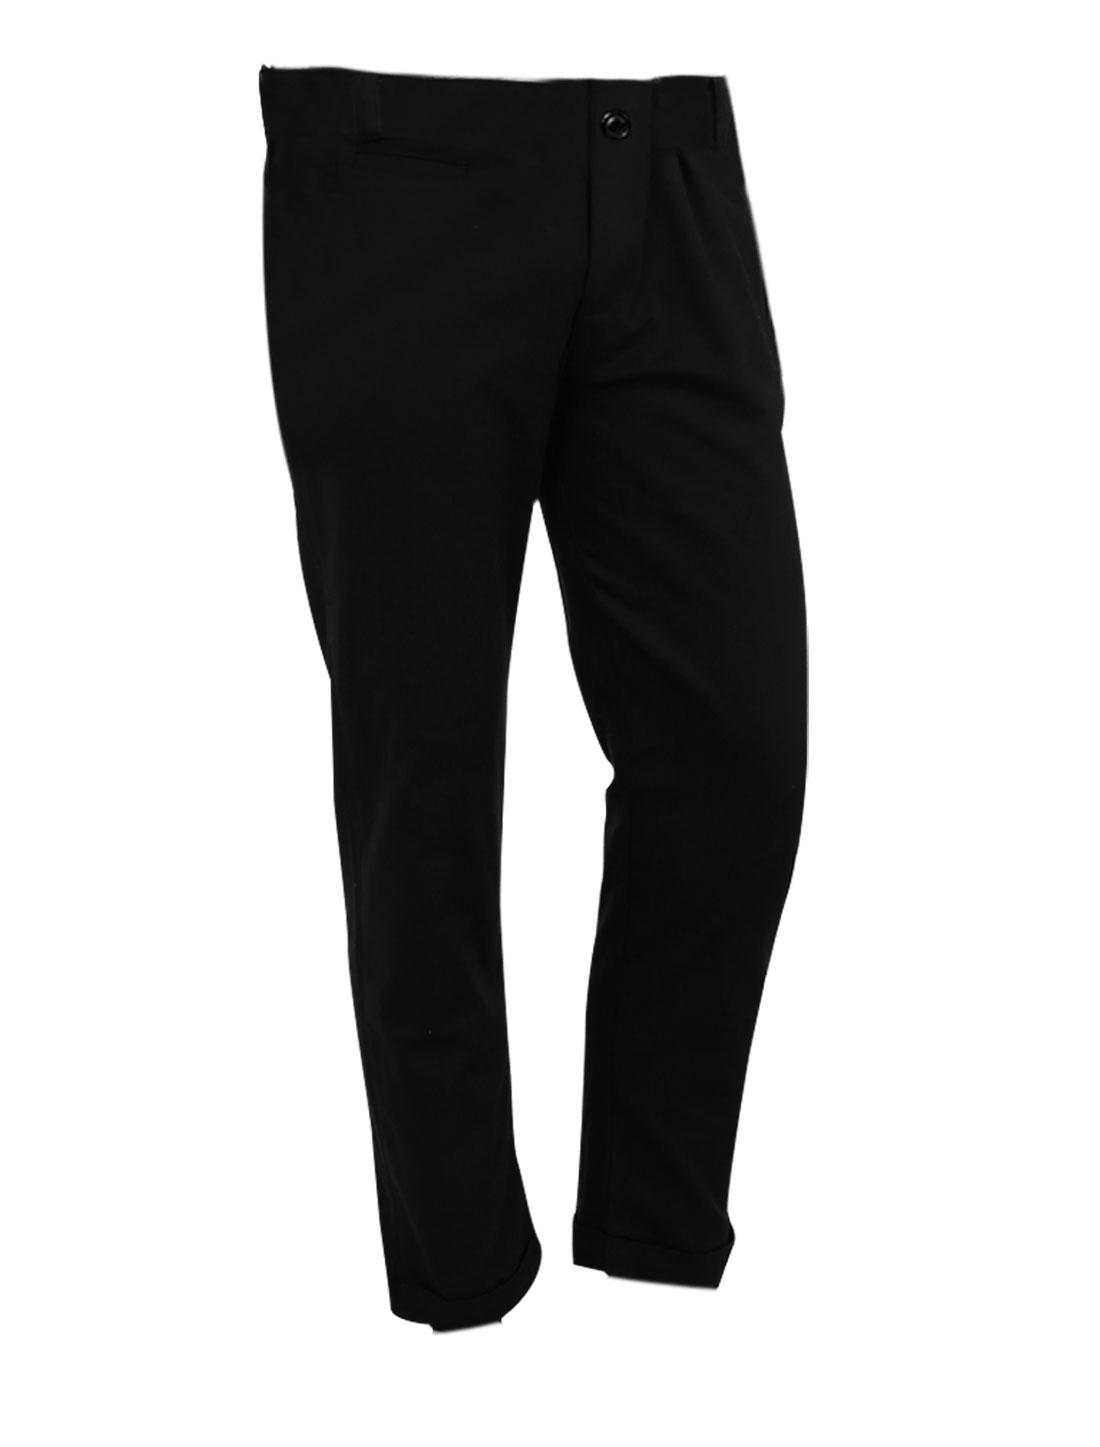 Men Fashion Belt Loop Waist Hip Patch Pockets Black Cropped Pants W35